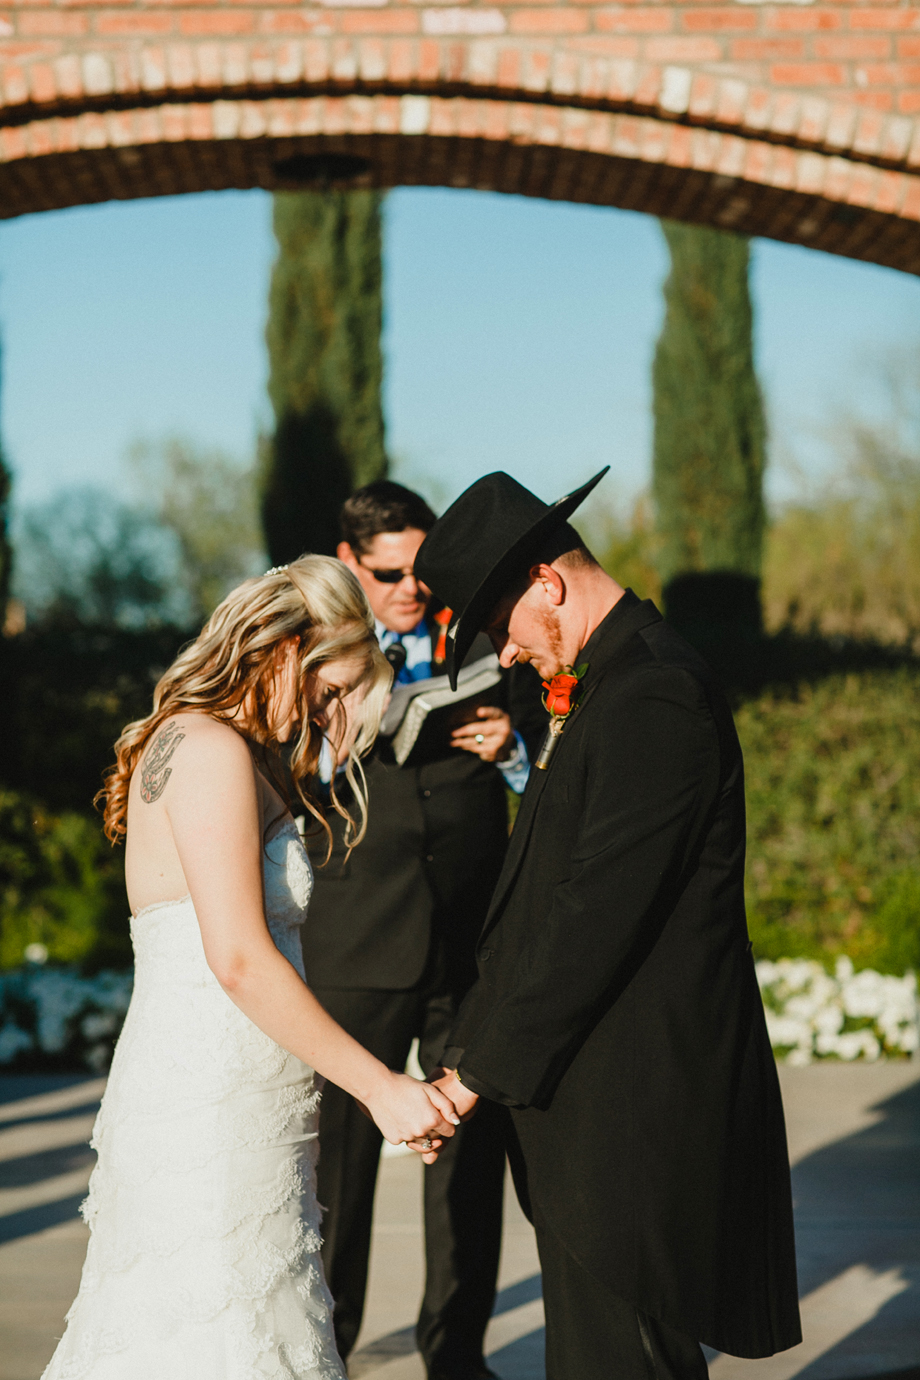 Jay & Jess, Weddings, Arizona-34.jpg